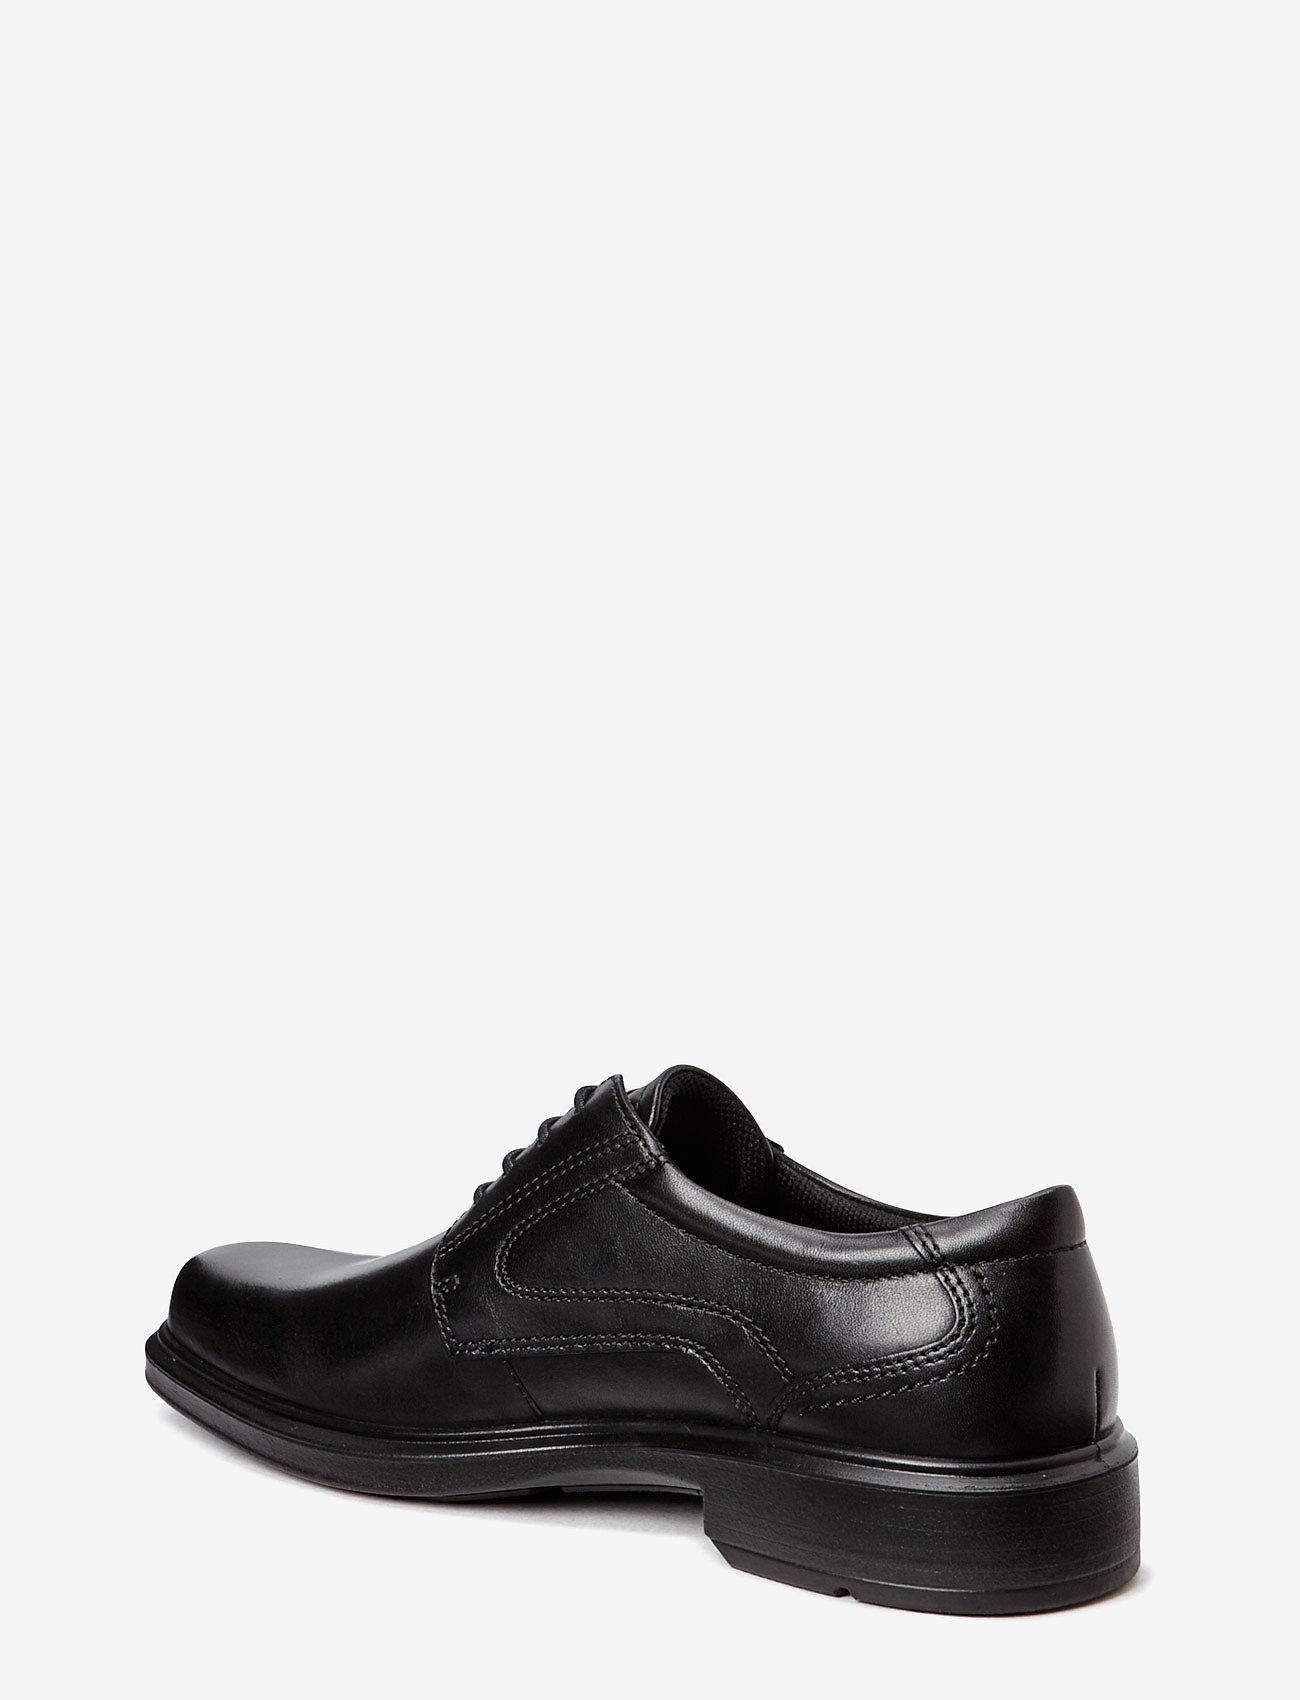 ECCO - HELSINKI - laced shoes - black - 1